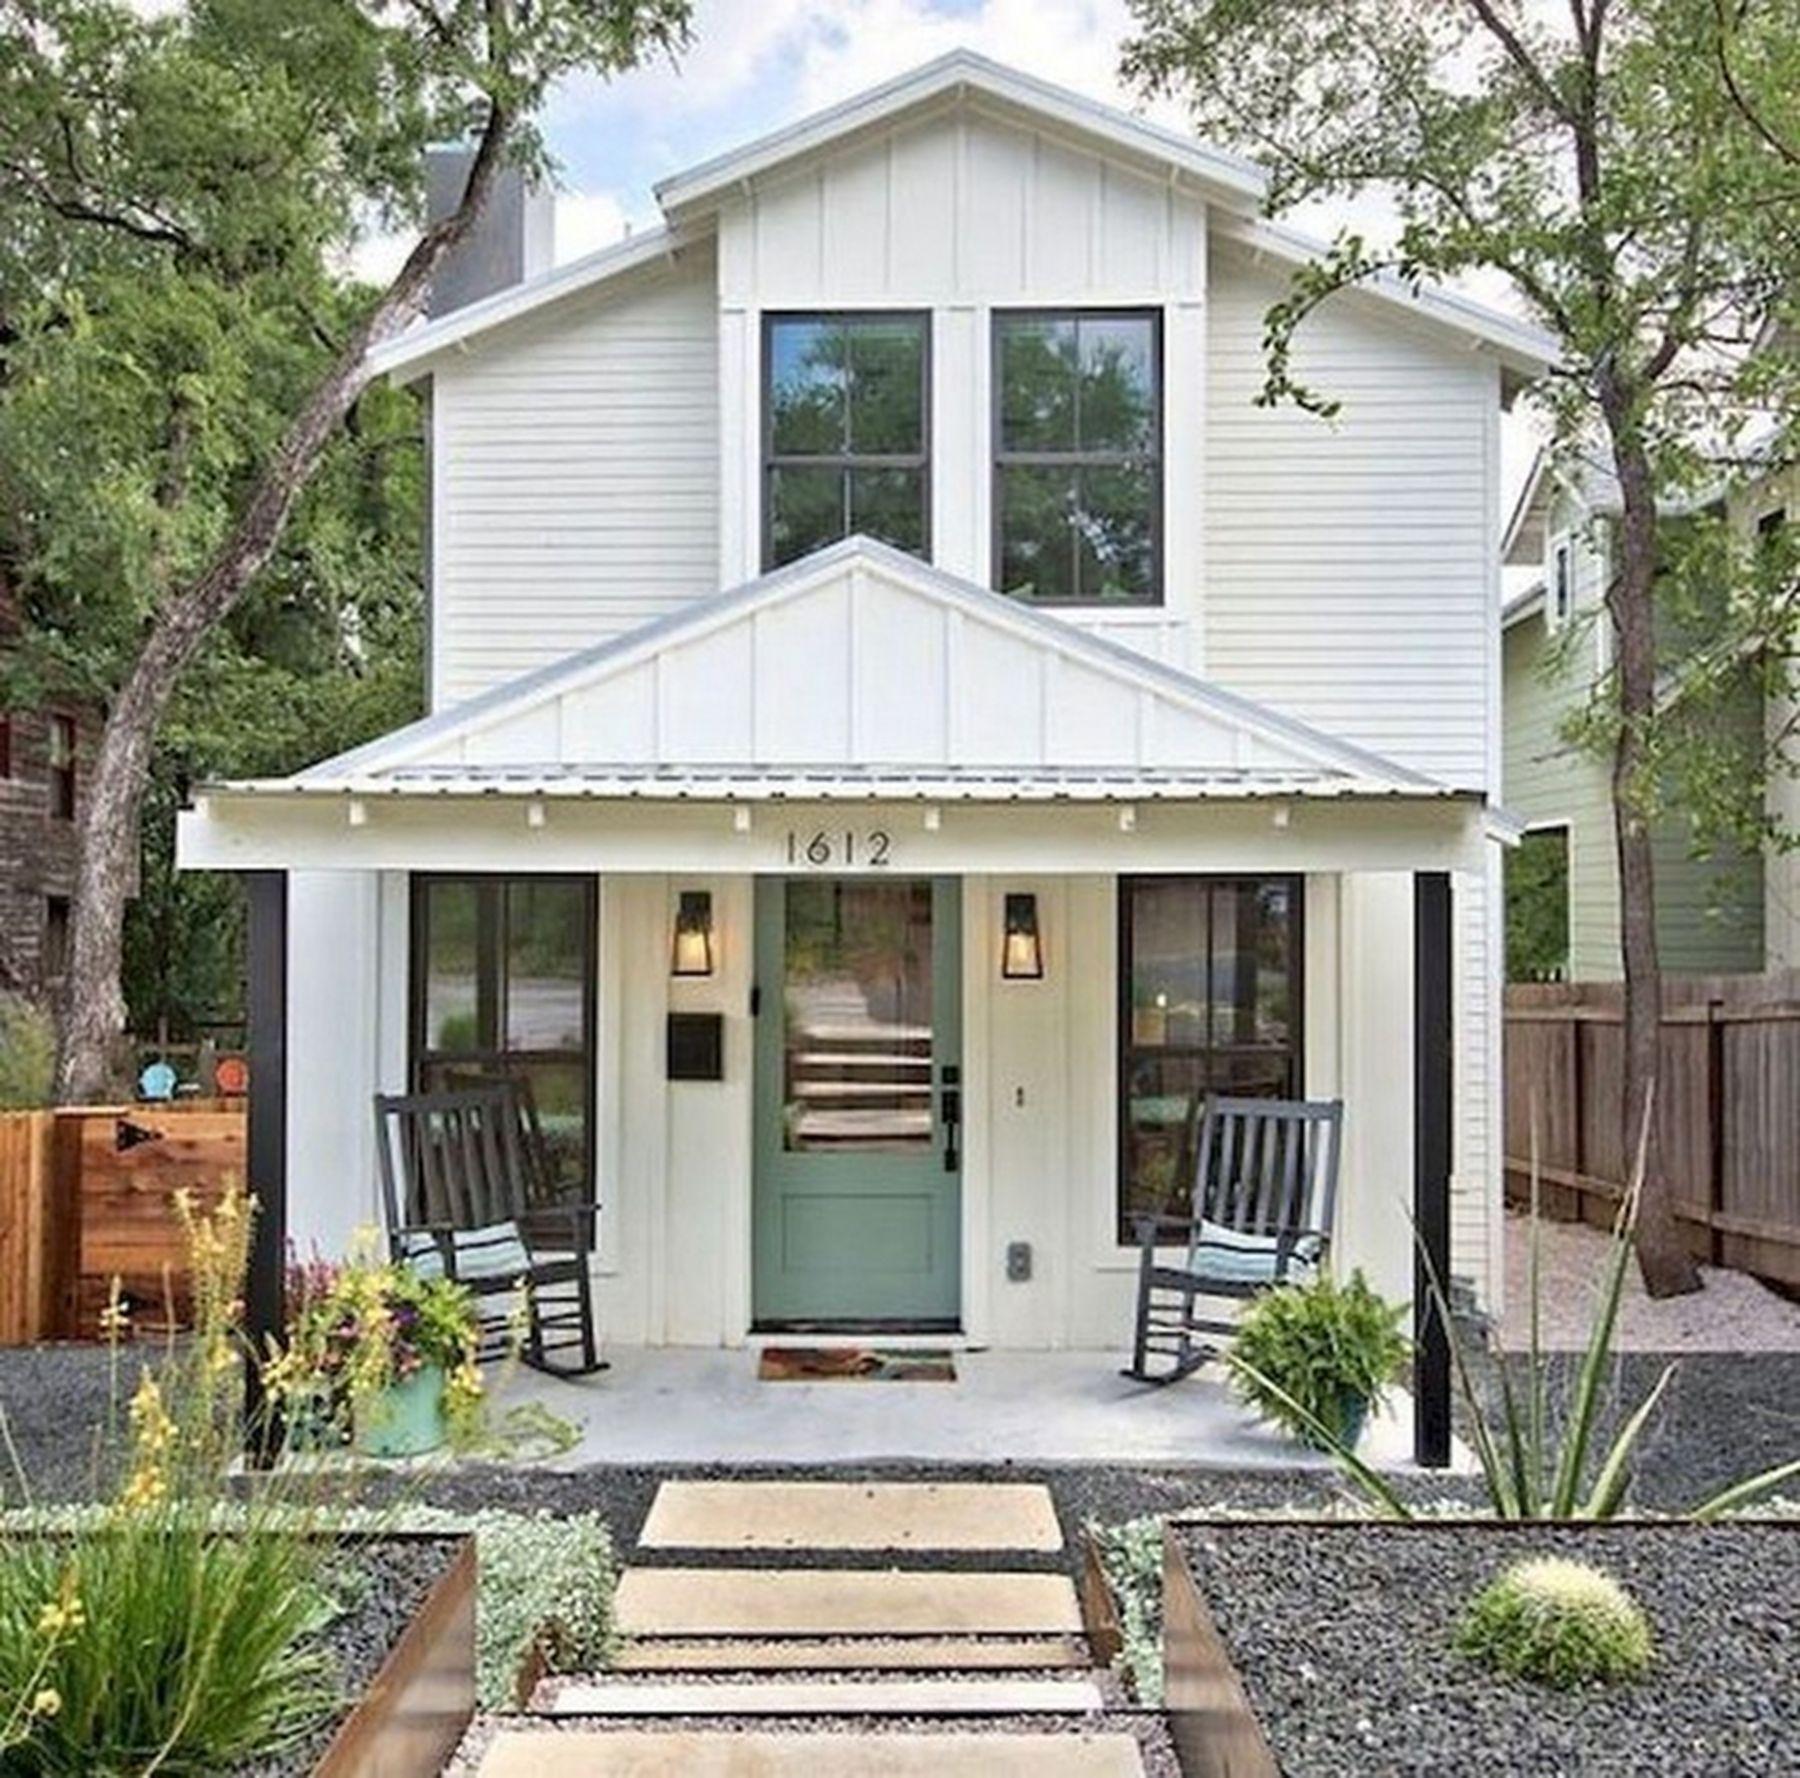 farmhouse exterior colors other than white